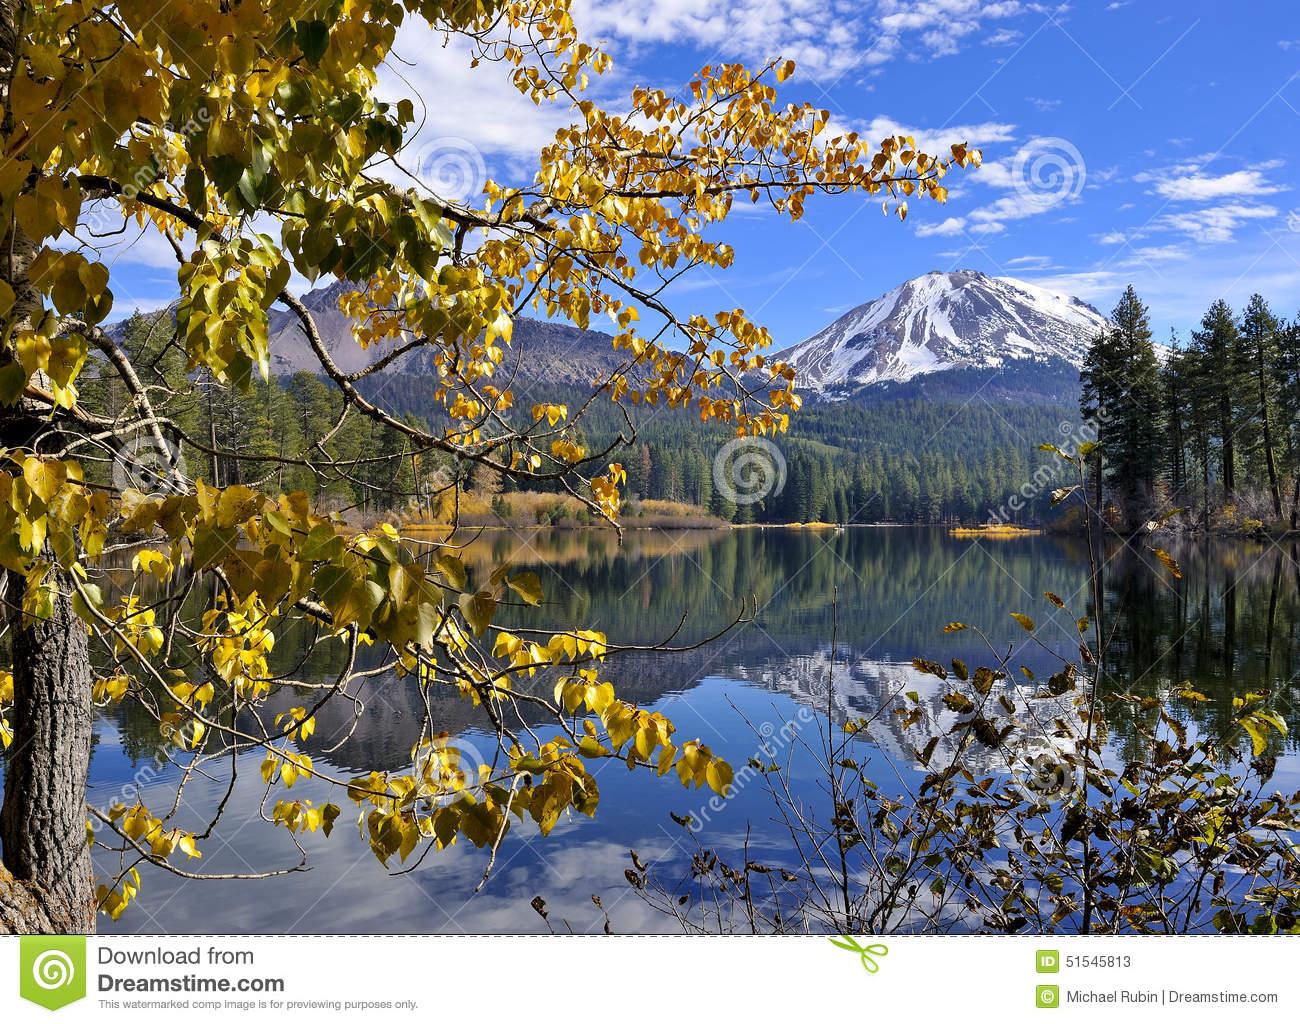 Autumn Foliage And Lassen Peak, Lassen Volcanic National Park.